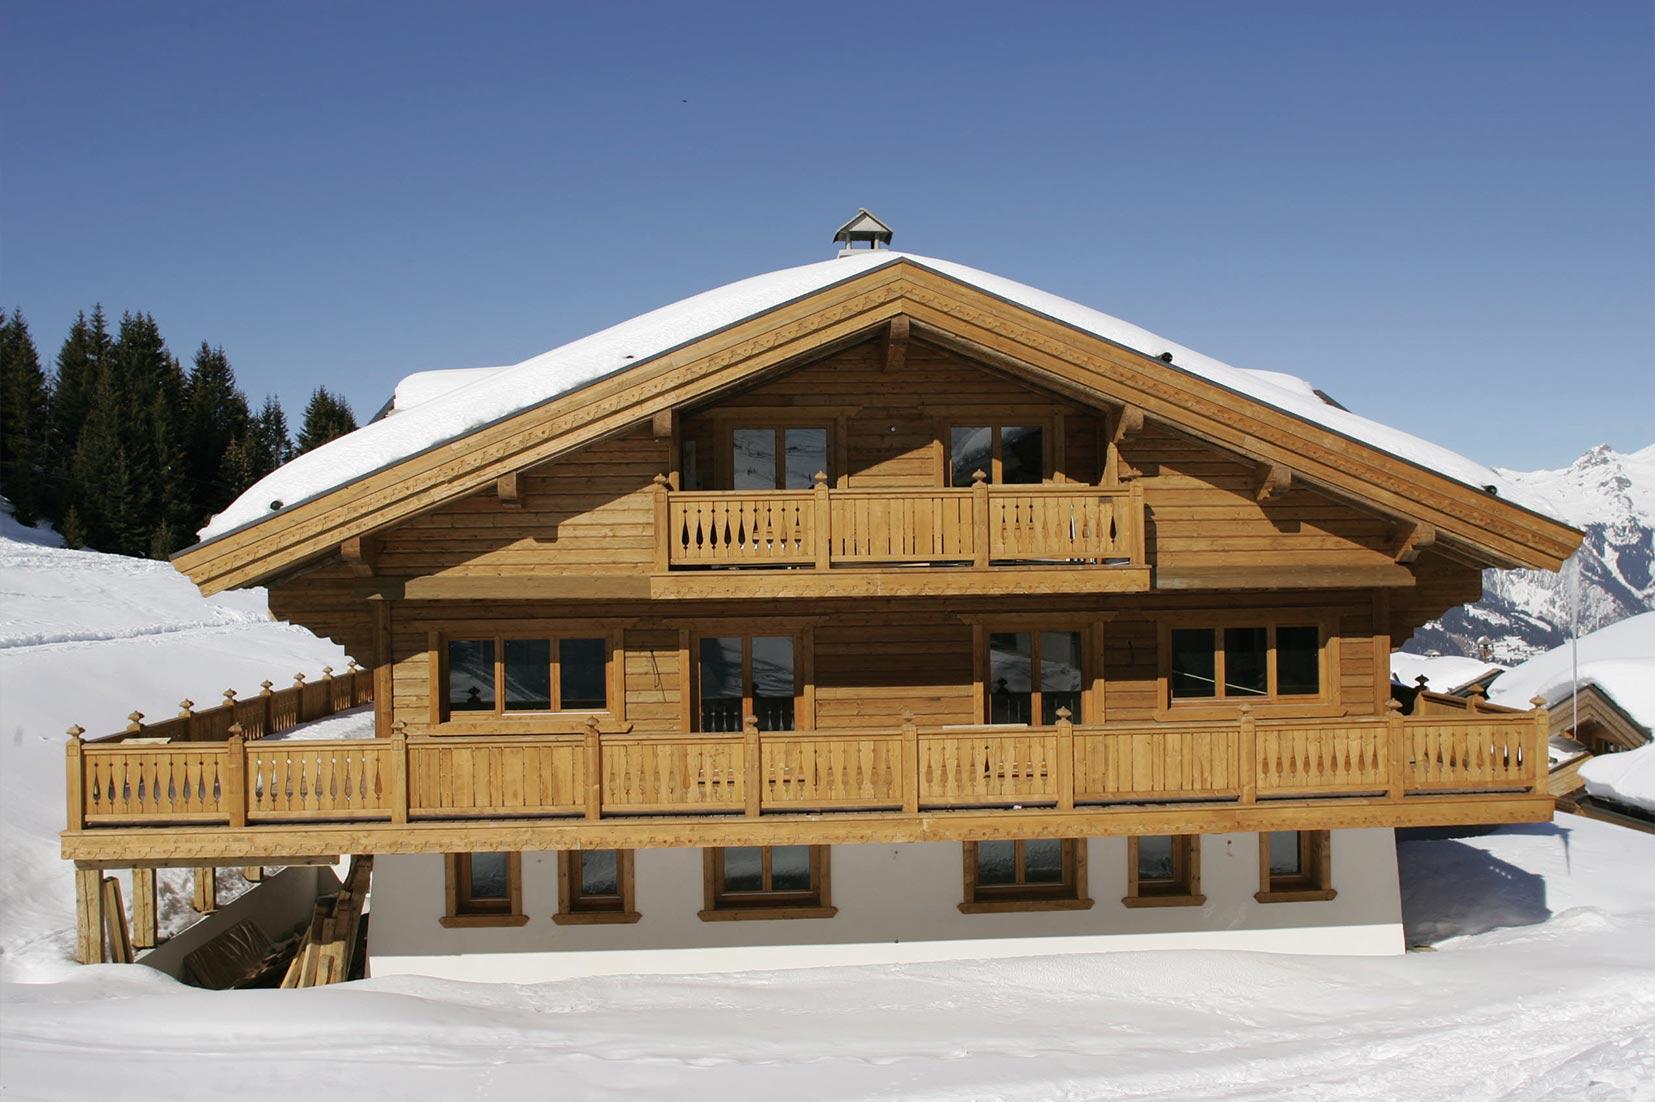 Ski Chalet Exterior